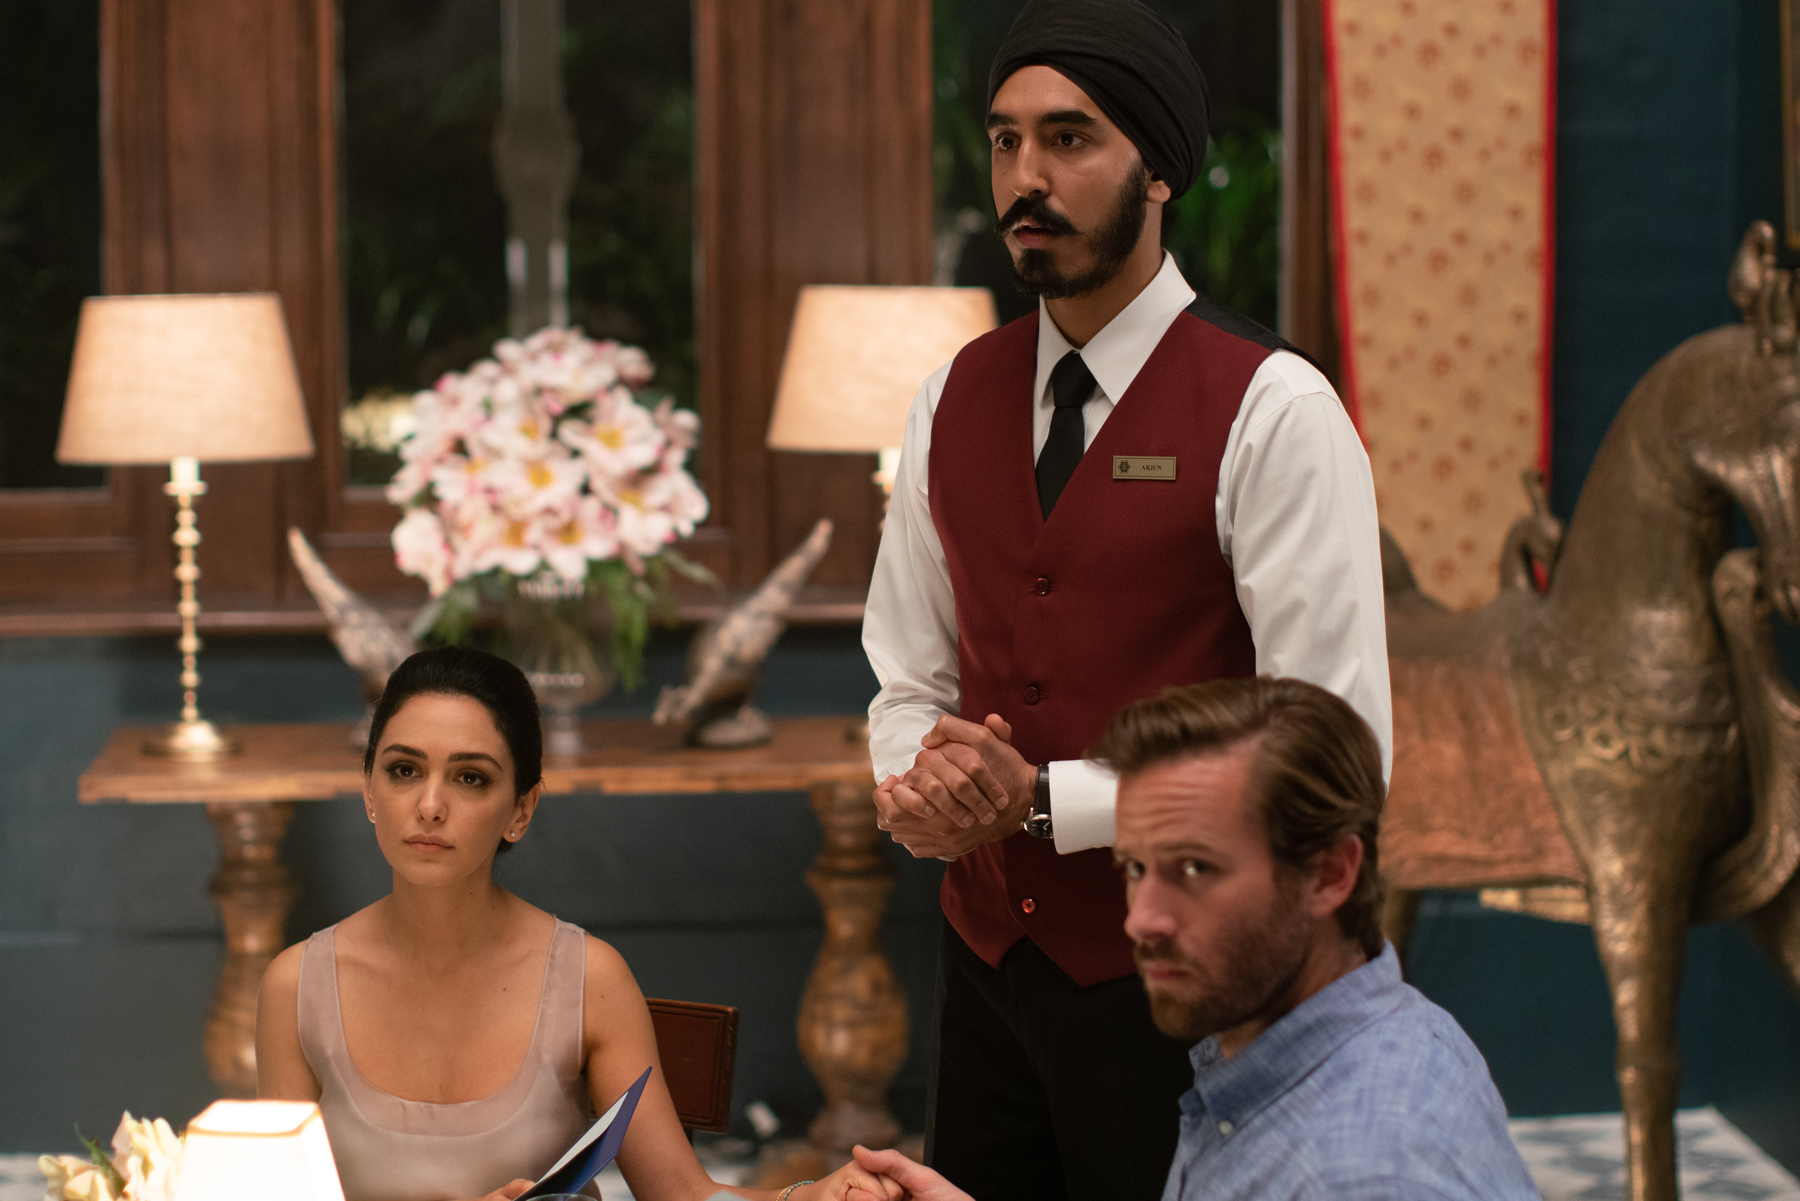 'Hotel Mumbai' Creates Entertainment Out of Horrific Real-Life Tragedy